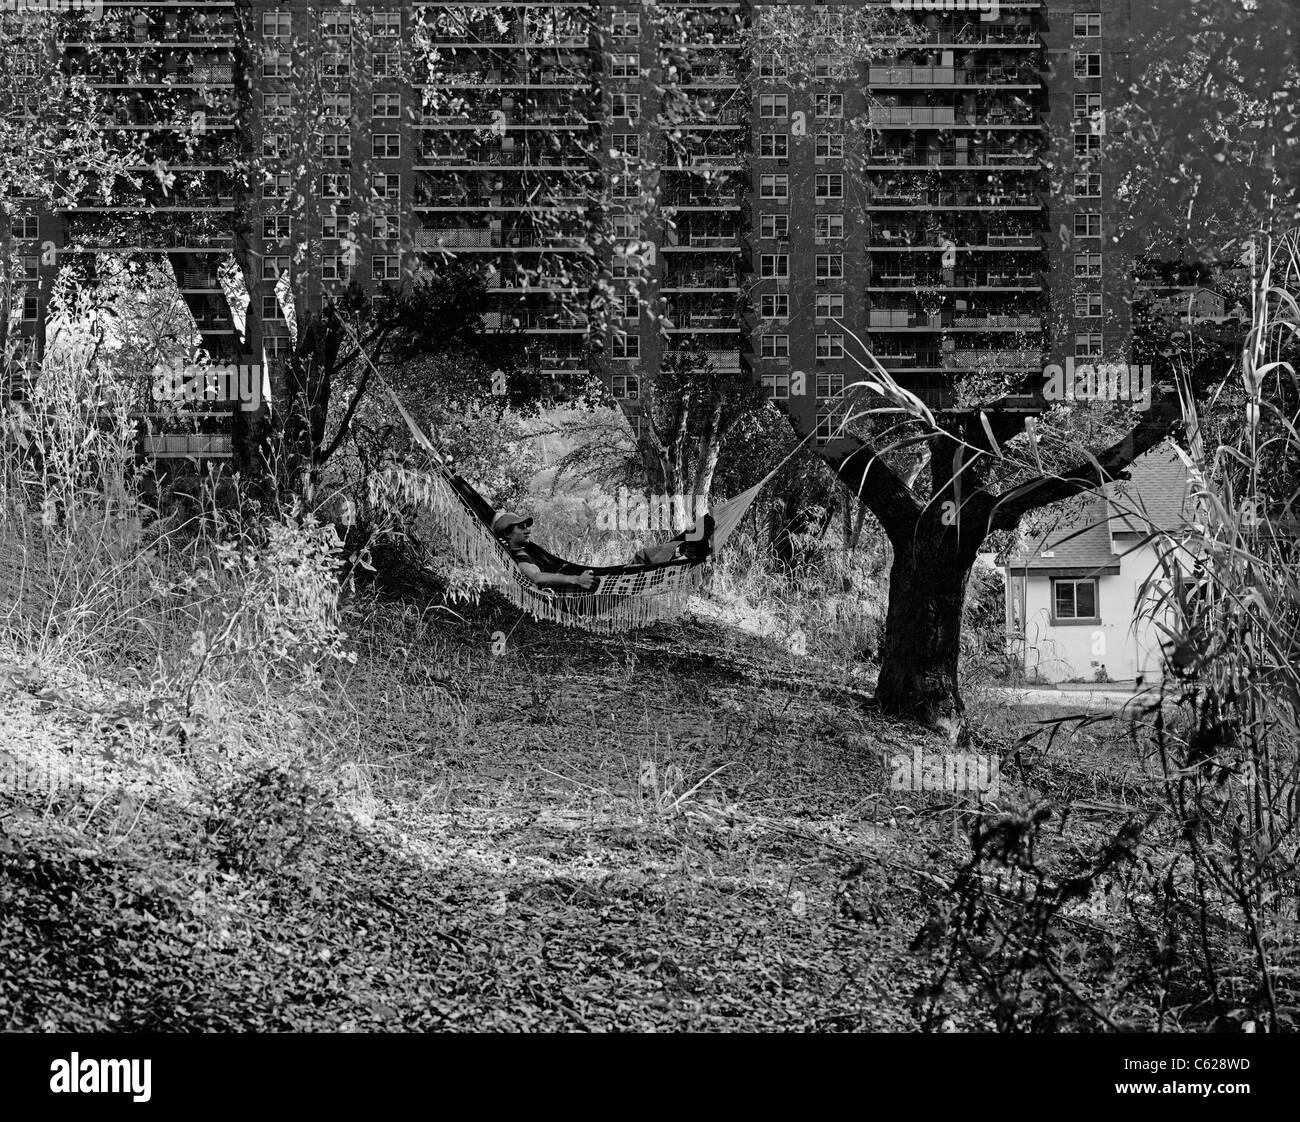 4x5 B&W film double exposure of man in hammock & apartment building in New York. © Craig M. Eisenberg - Stock Image